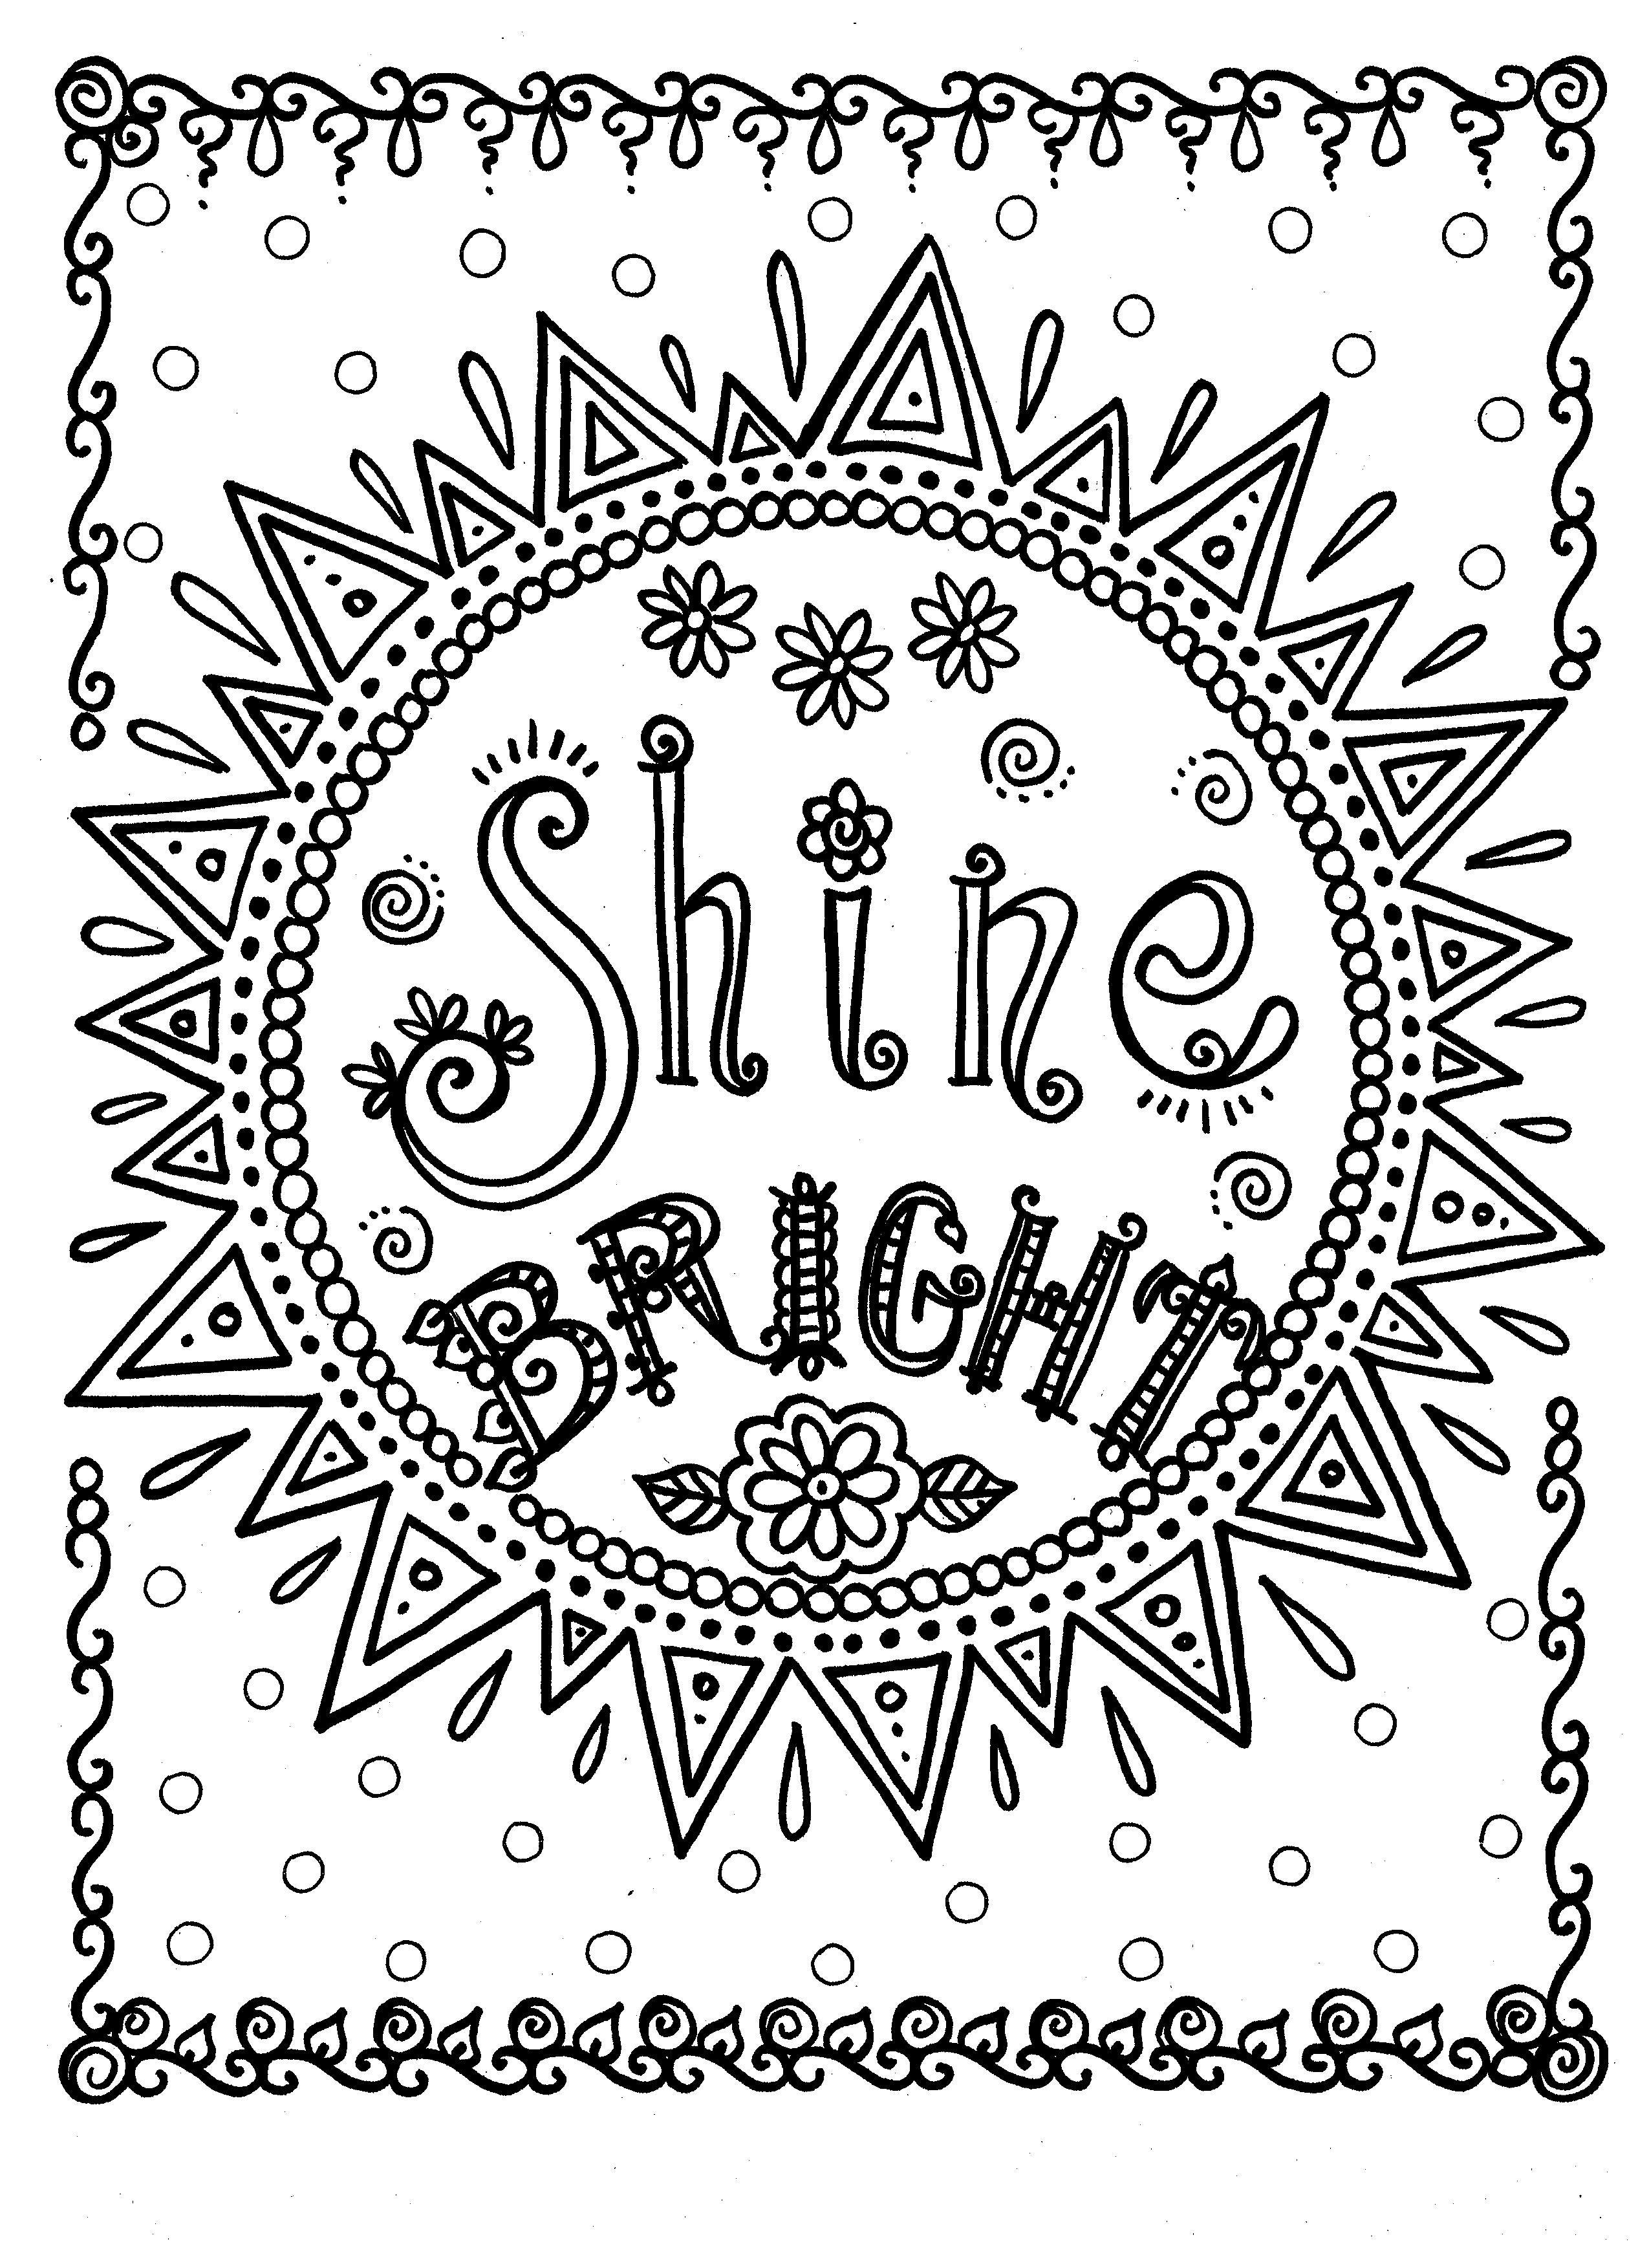 Shine Bright by Deborah Muller ChubbyMermaid